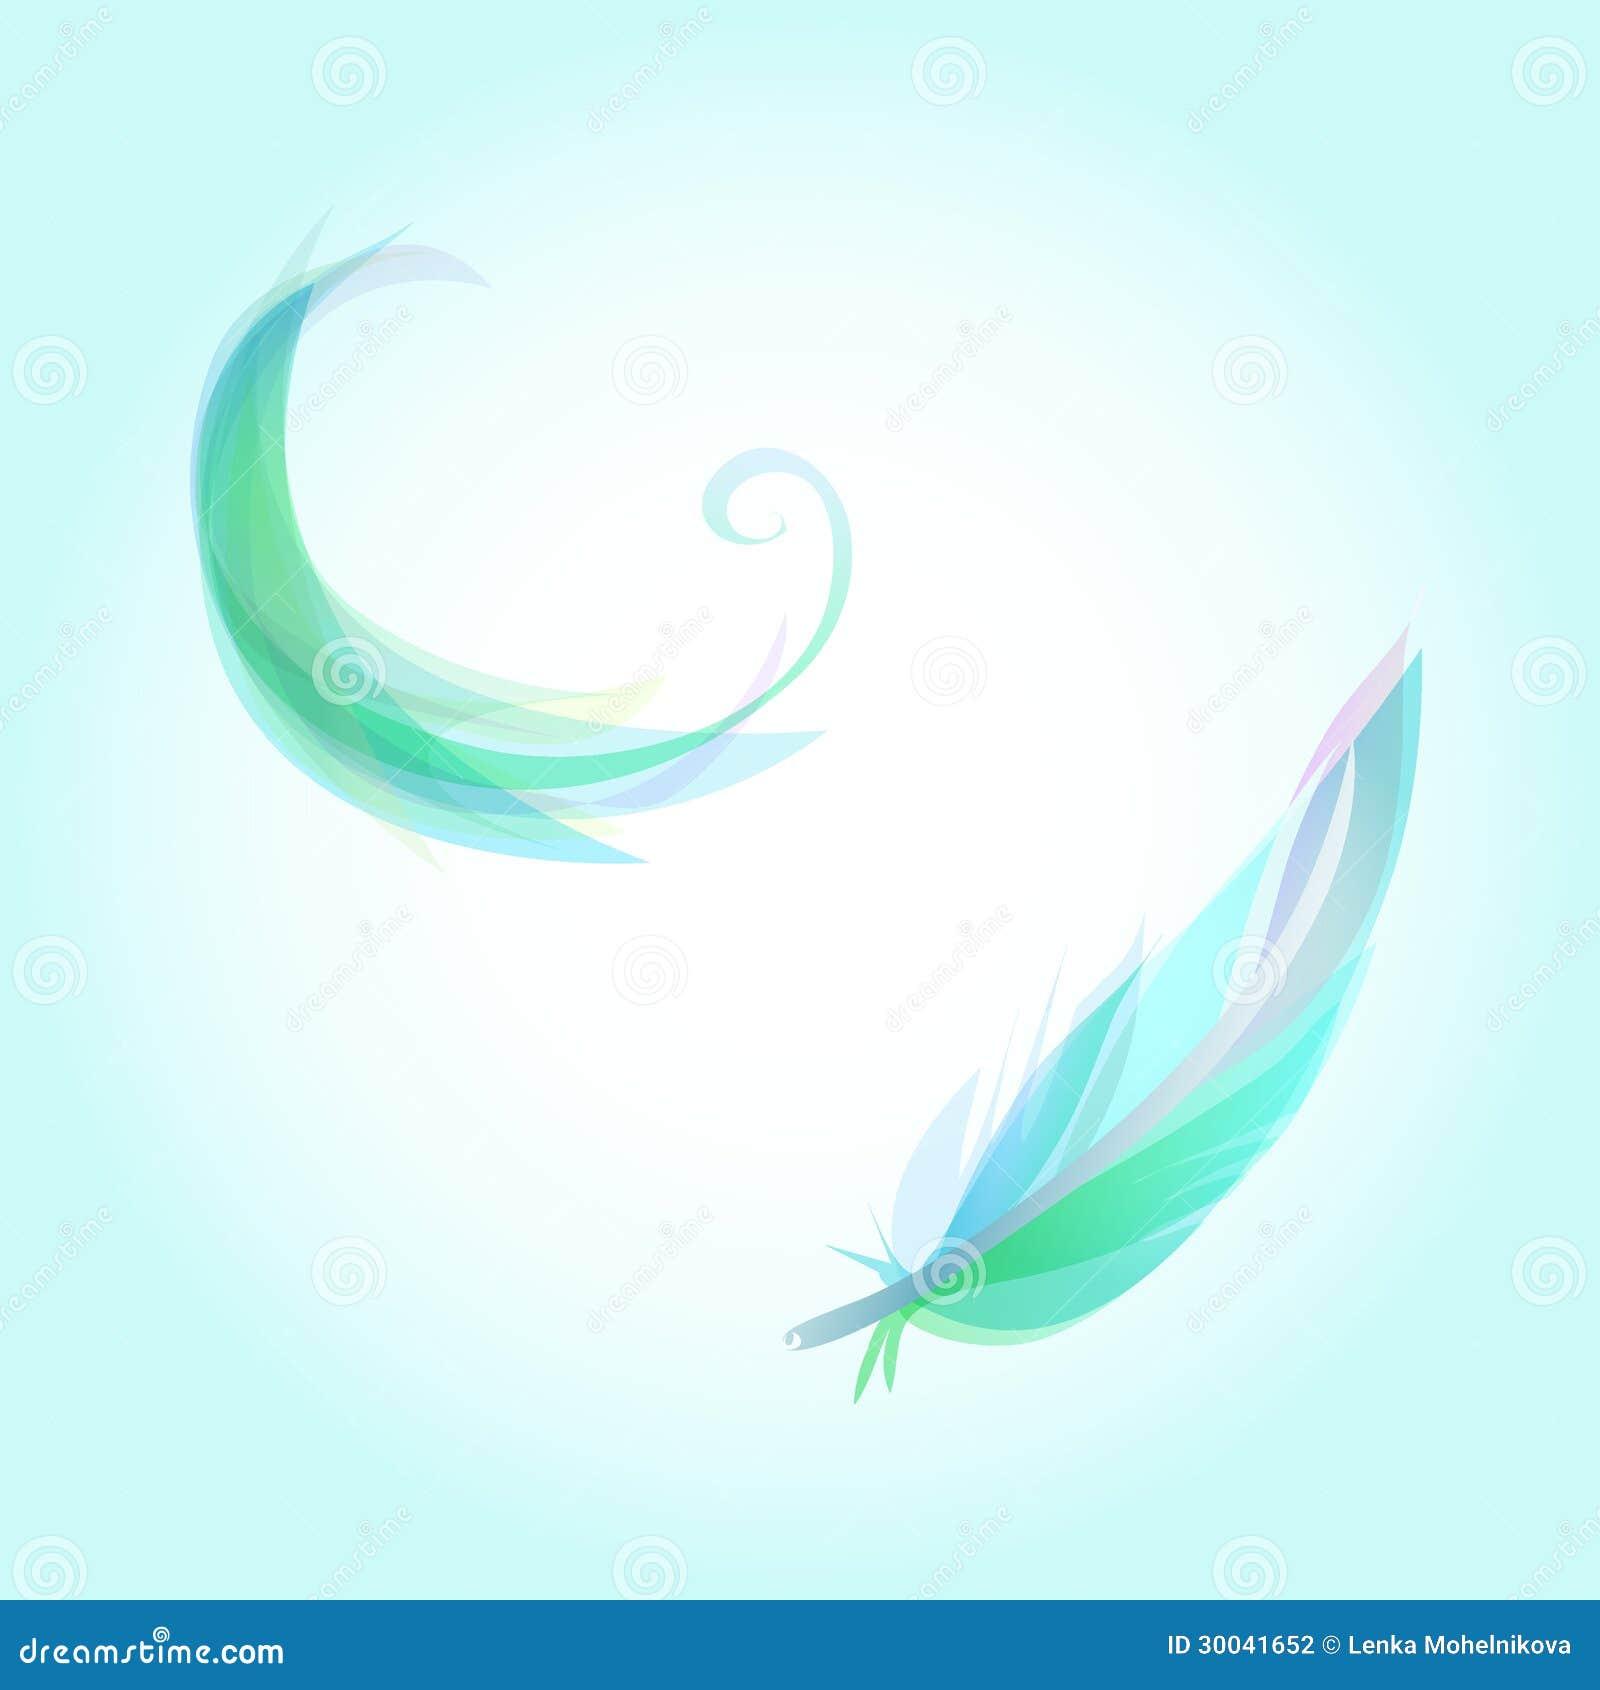 falling feathers stock illustration illustration of purity 30041652